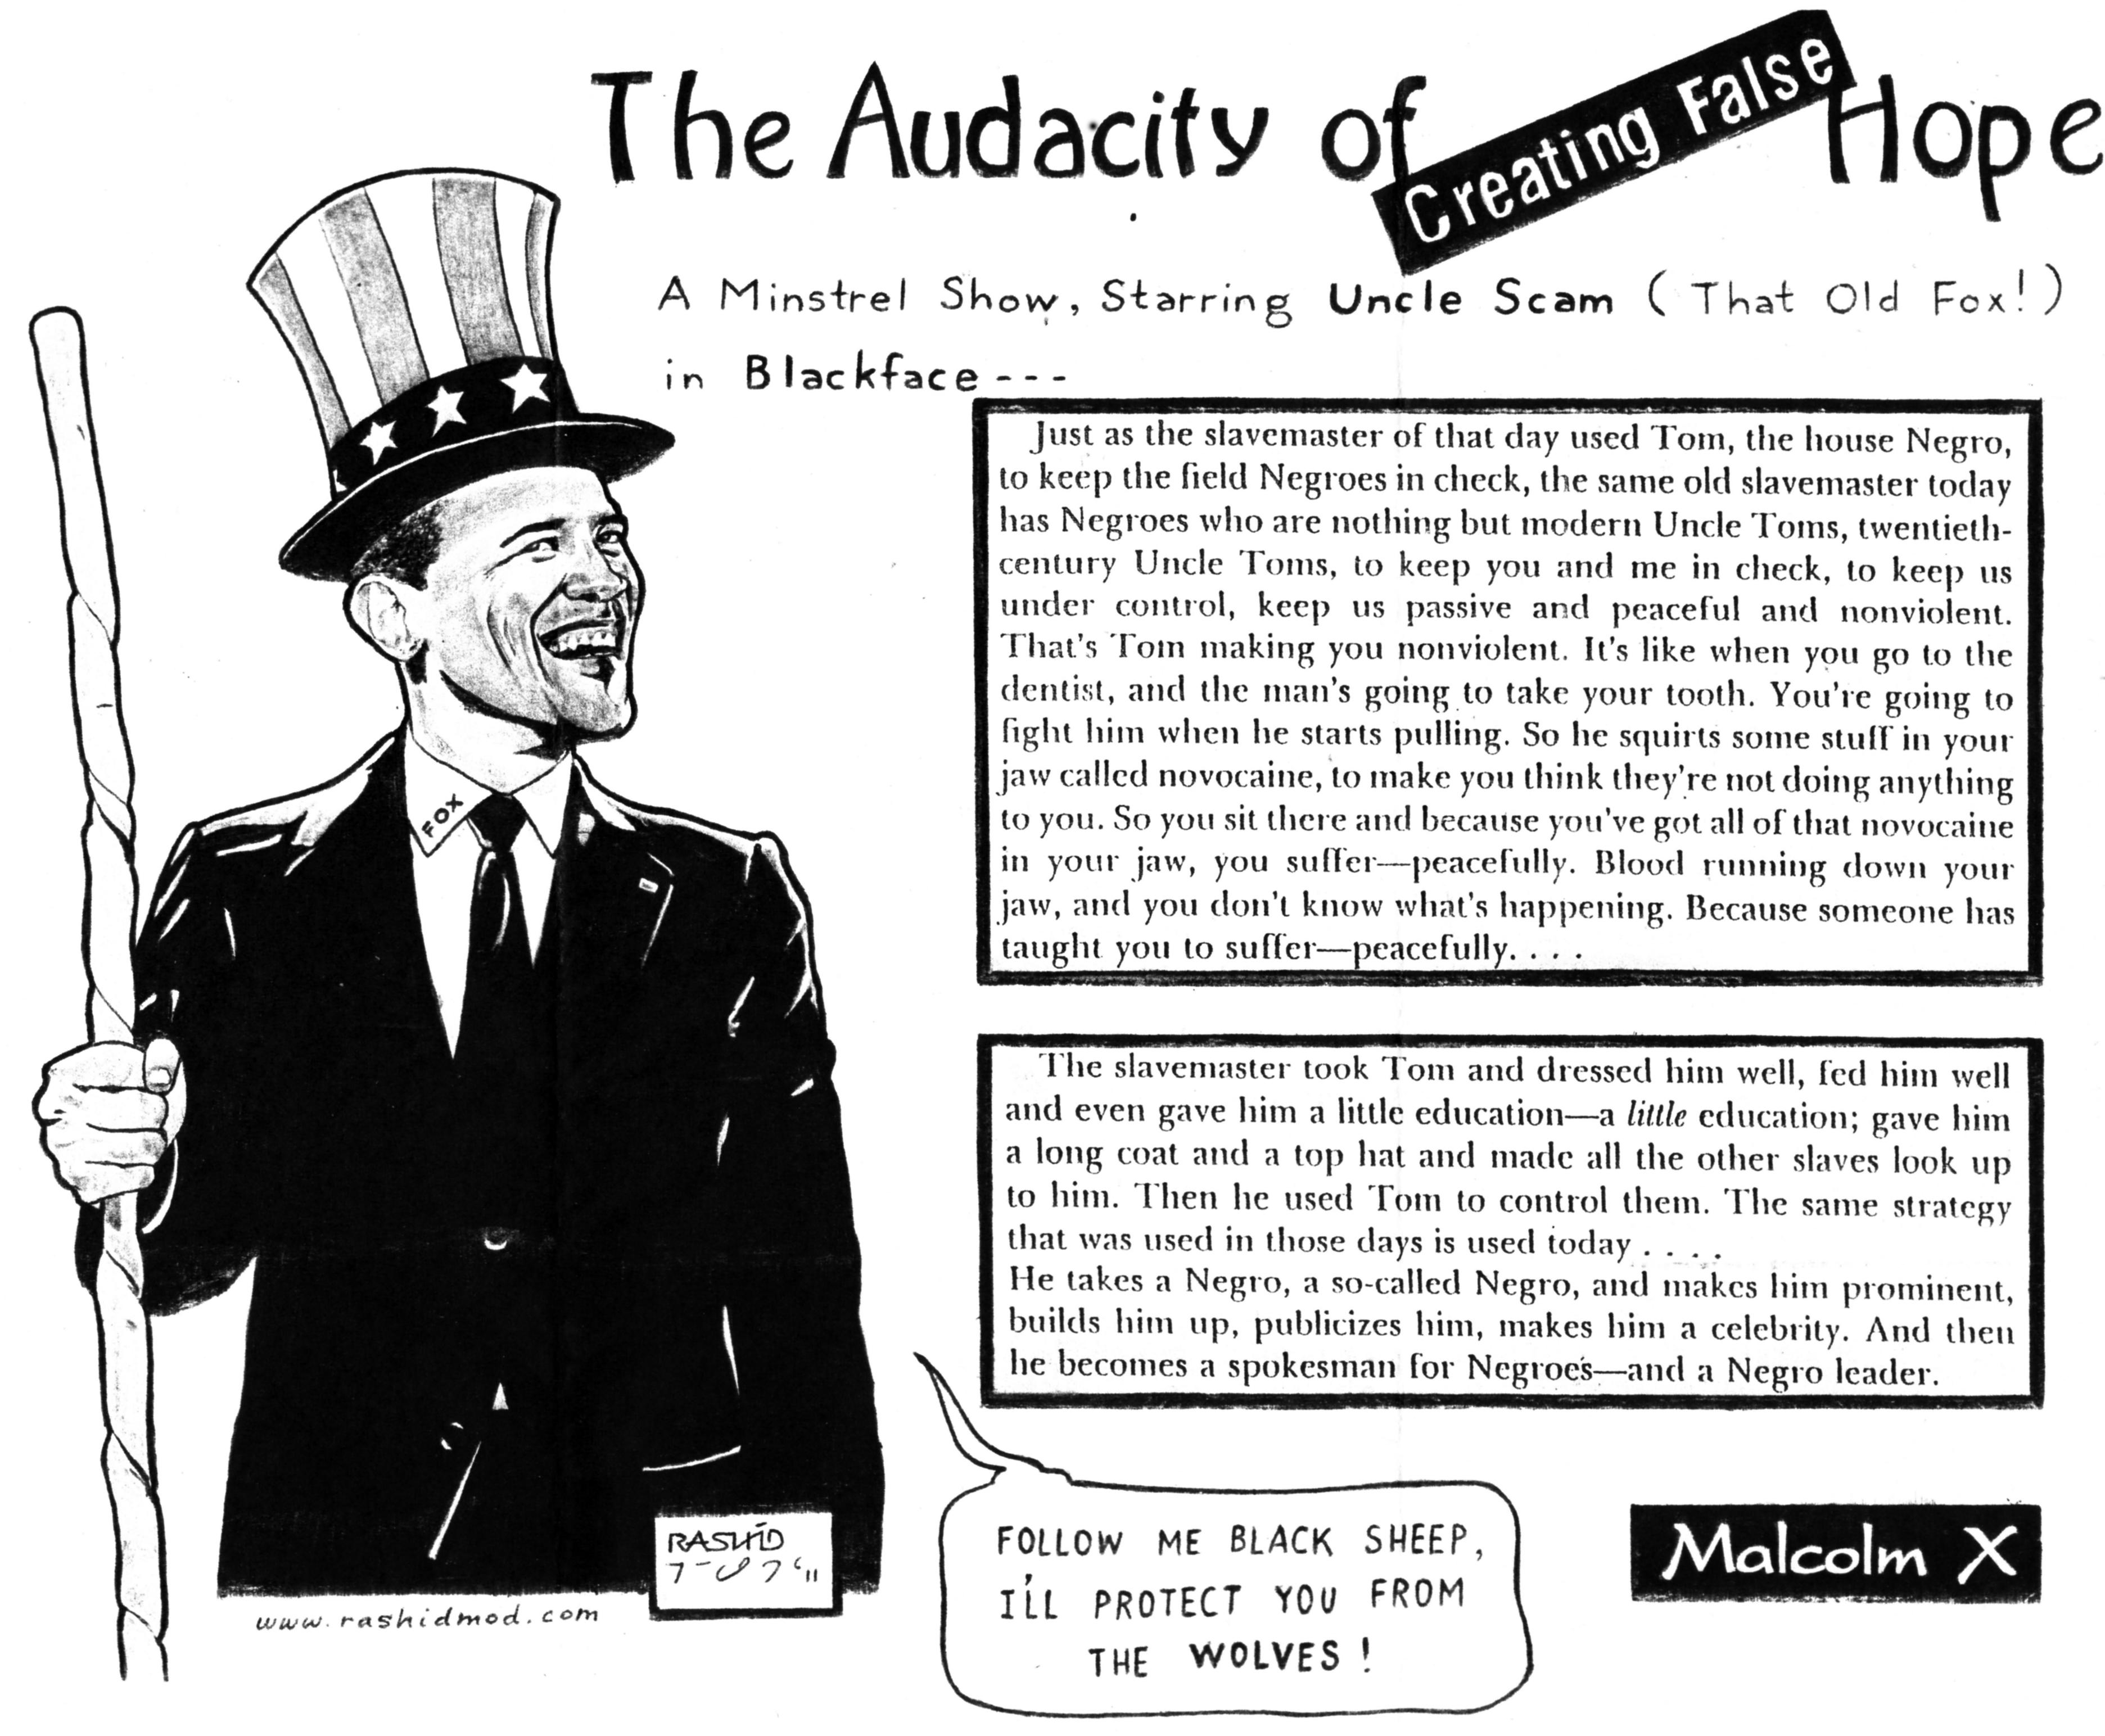 The Audacity of False Hope